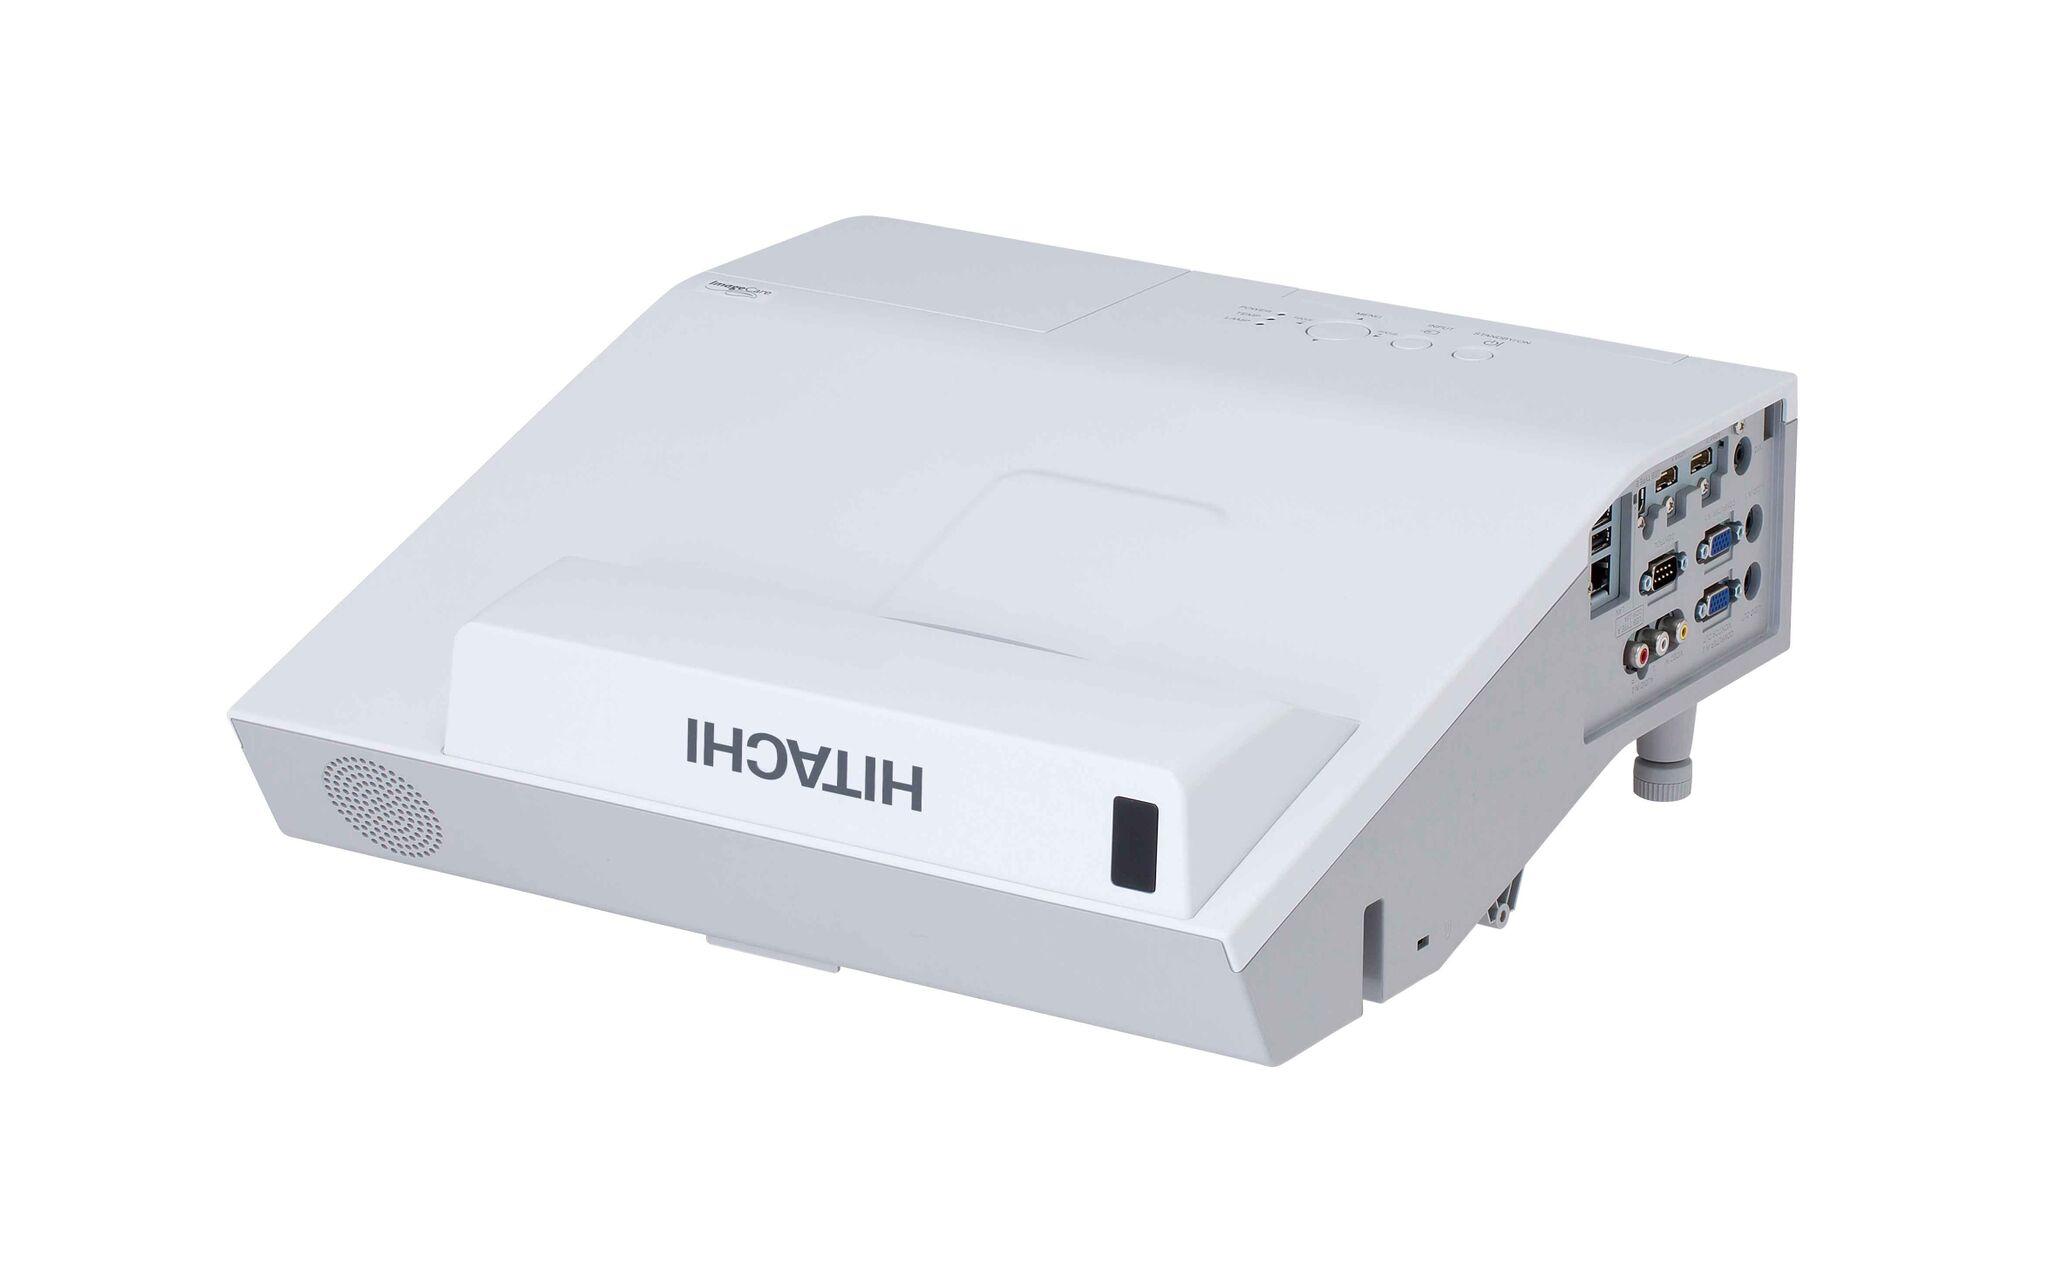 Maxell MC-AX3506 3600lm XGA Ultra Short Throw LCD Projector